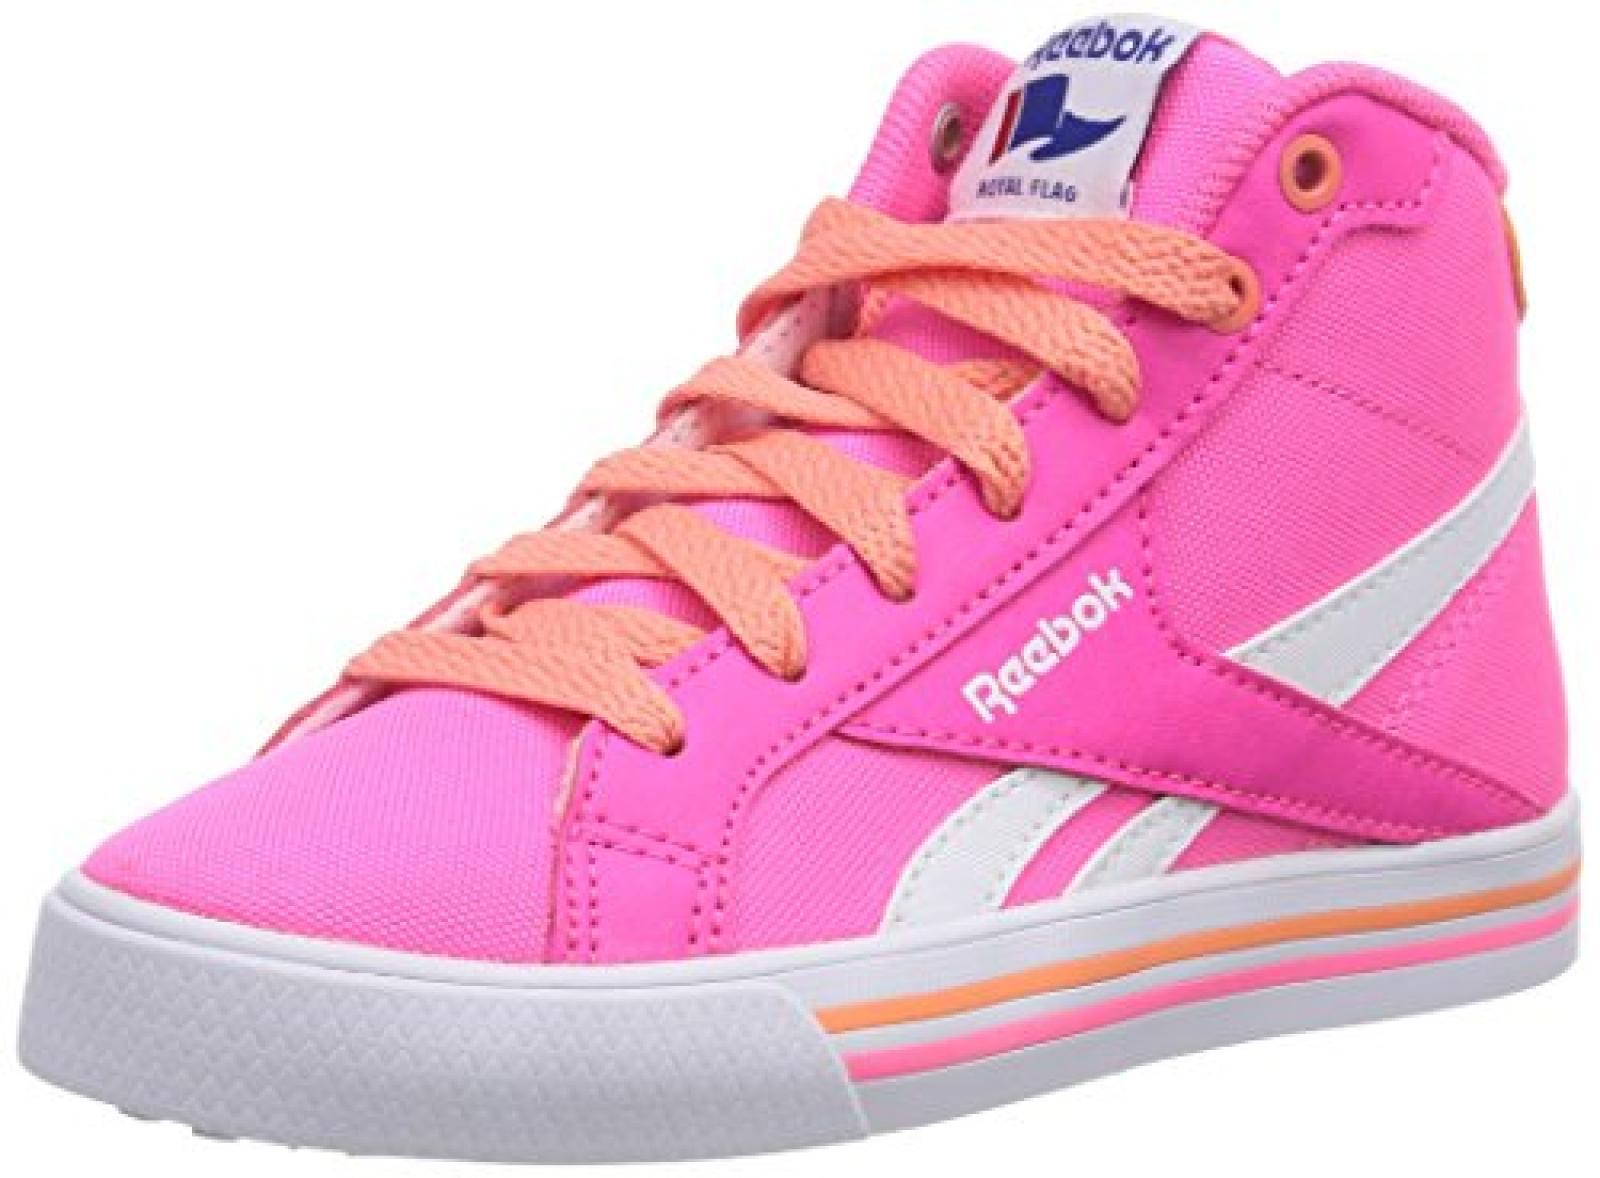 Reebok Royal Comp  CVS Mädchen Hohe Sneakers